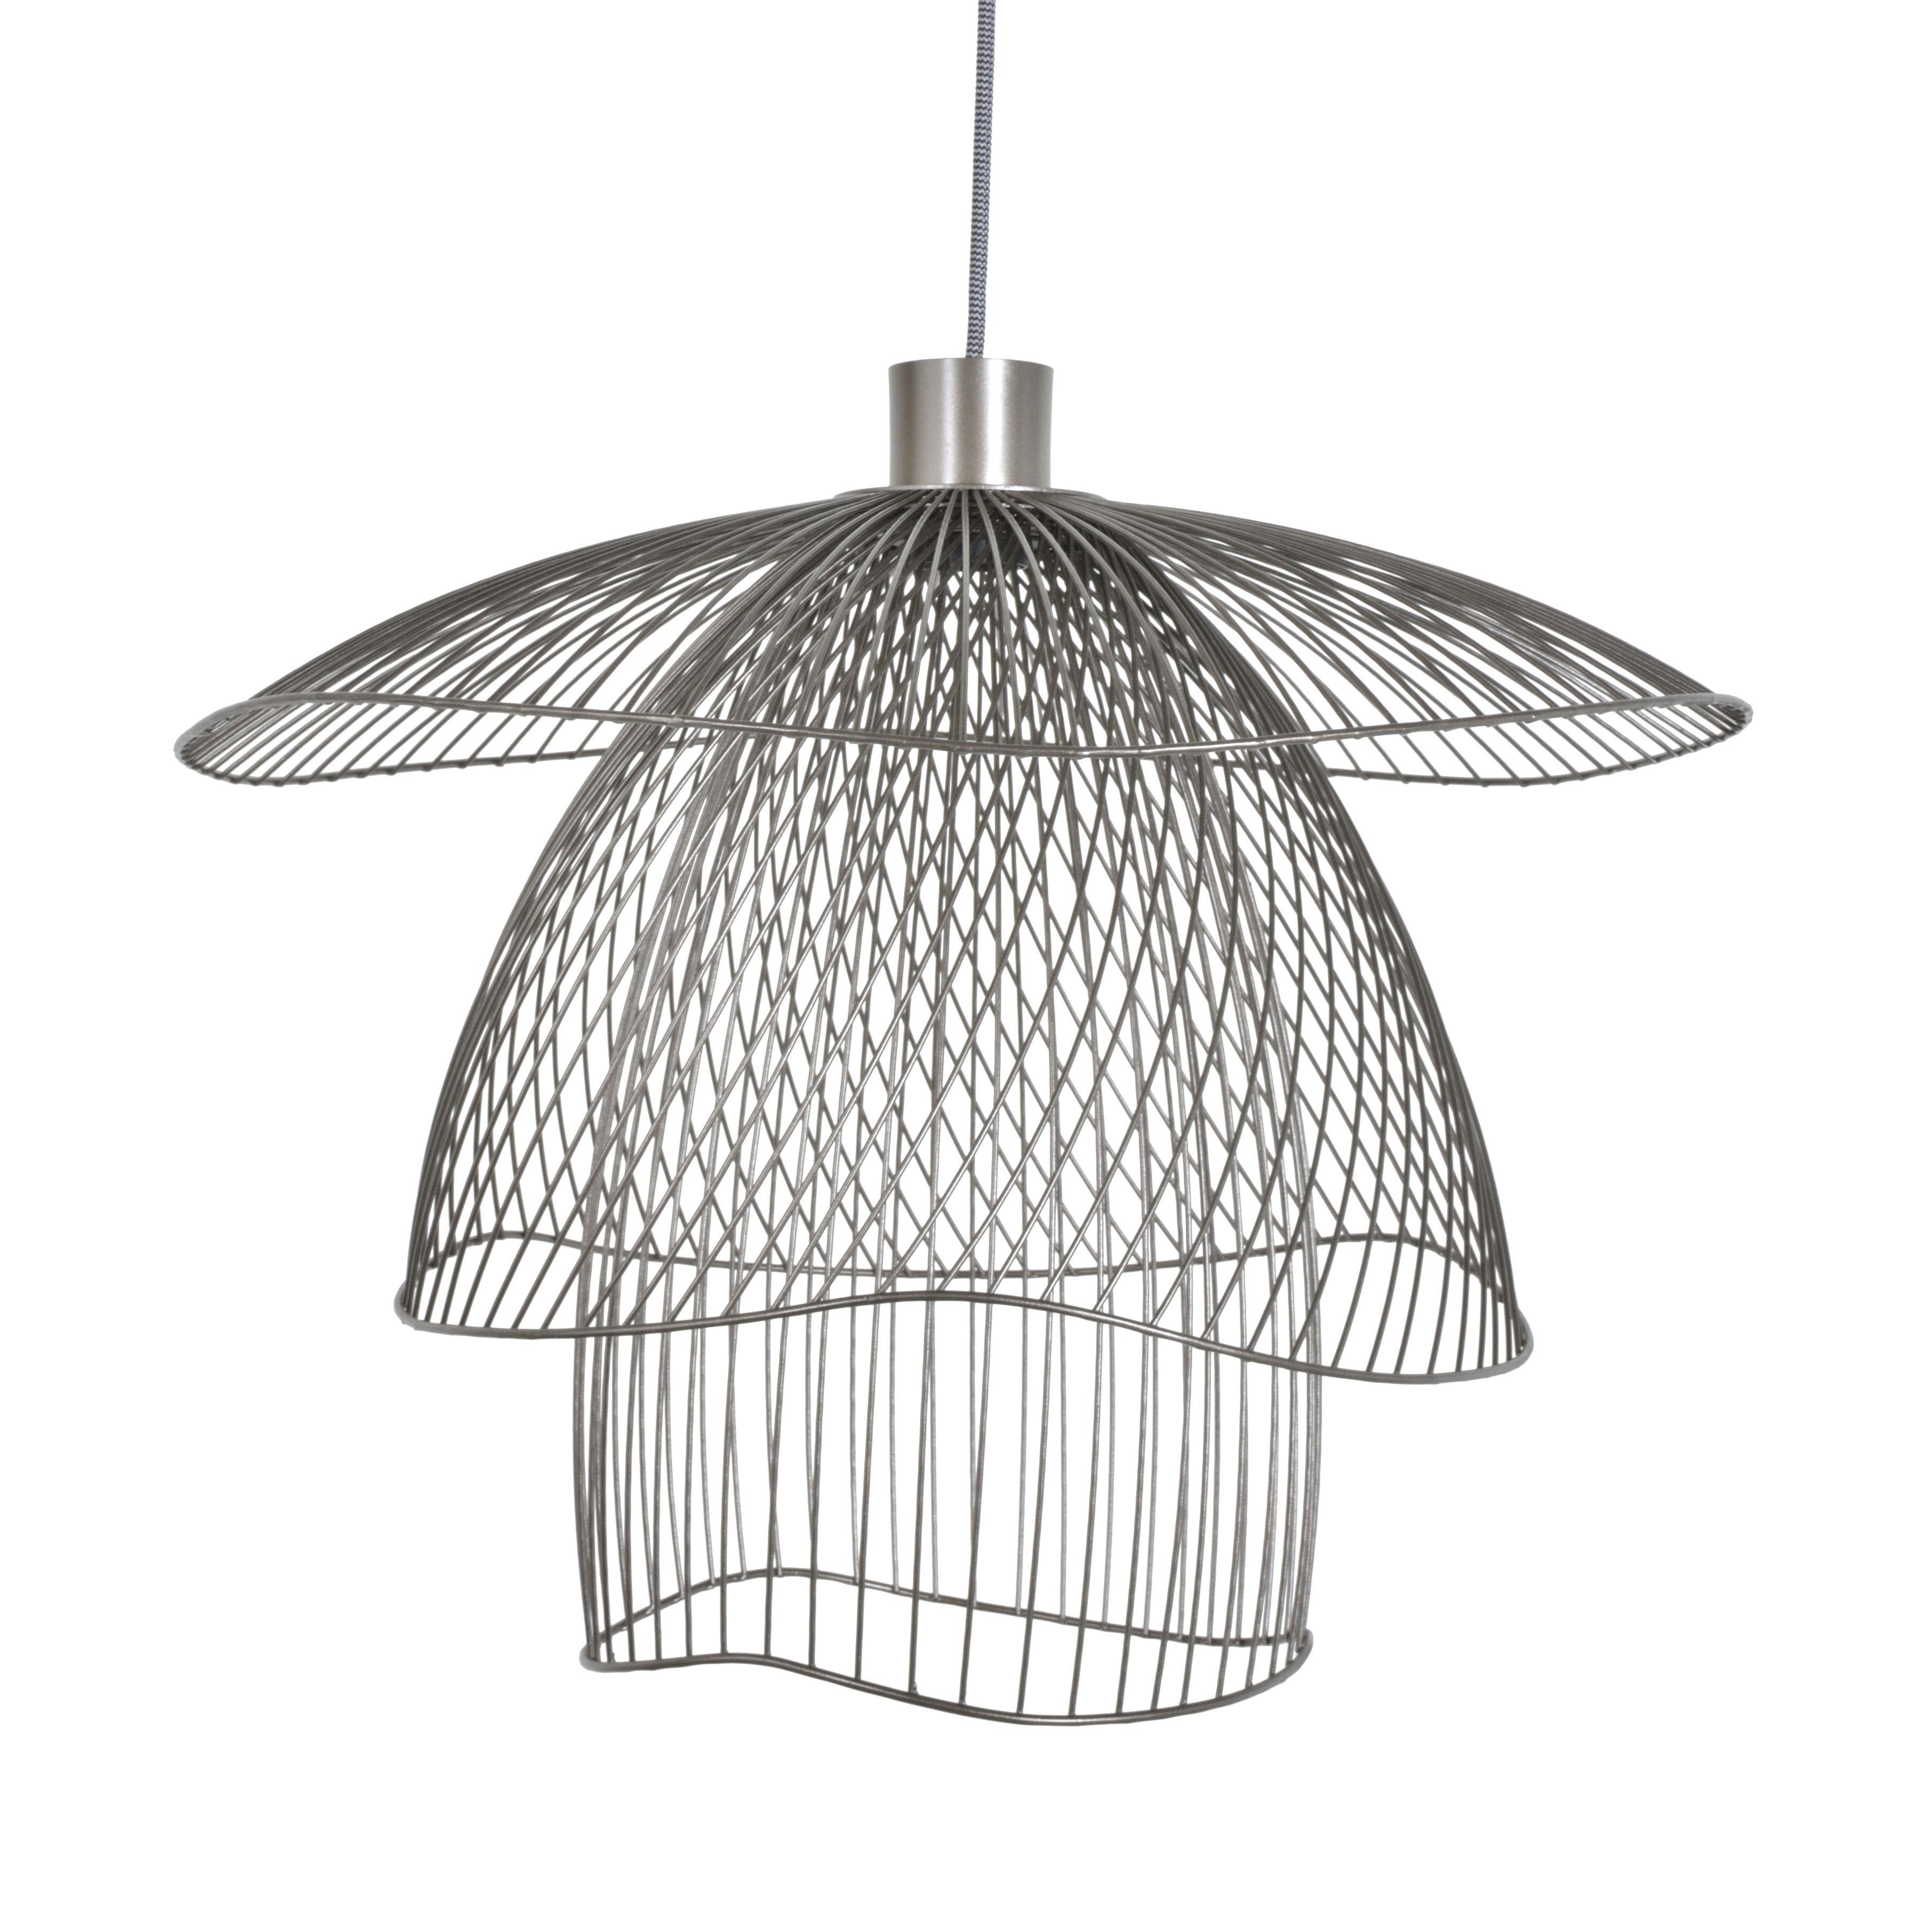 Lighting - Pendant Lighting - Papillon Small Pendant - / Ø 56 cm by Forestier - Metallic taupe - Powder coated steel